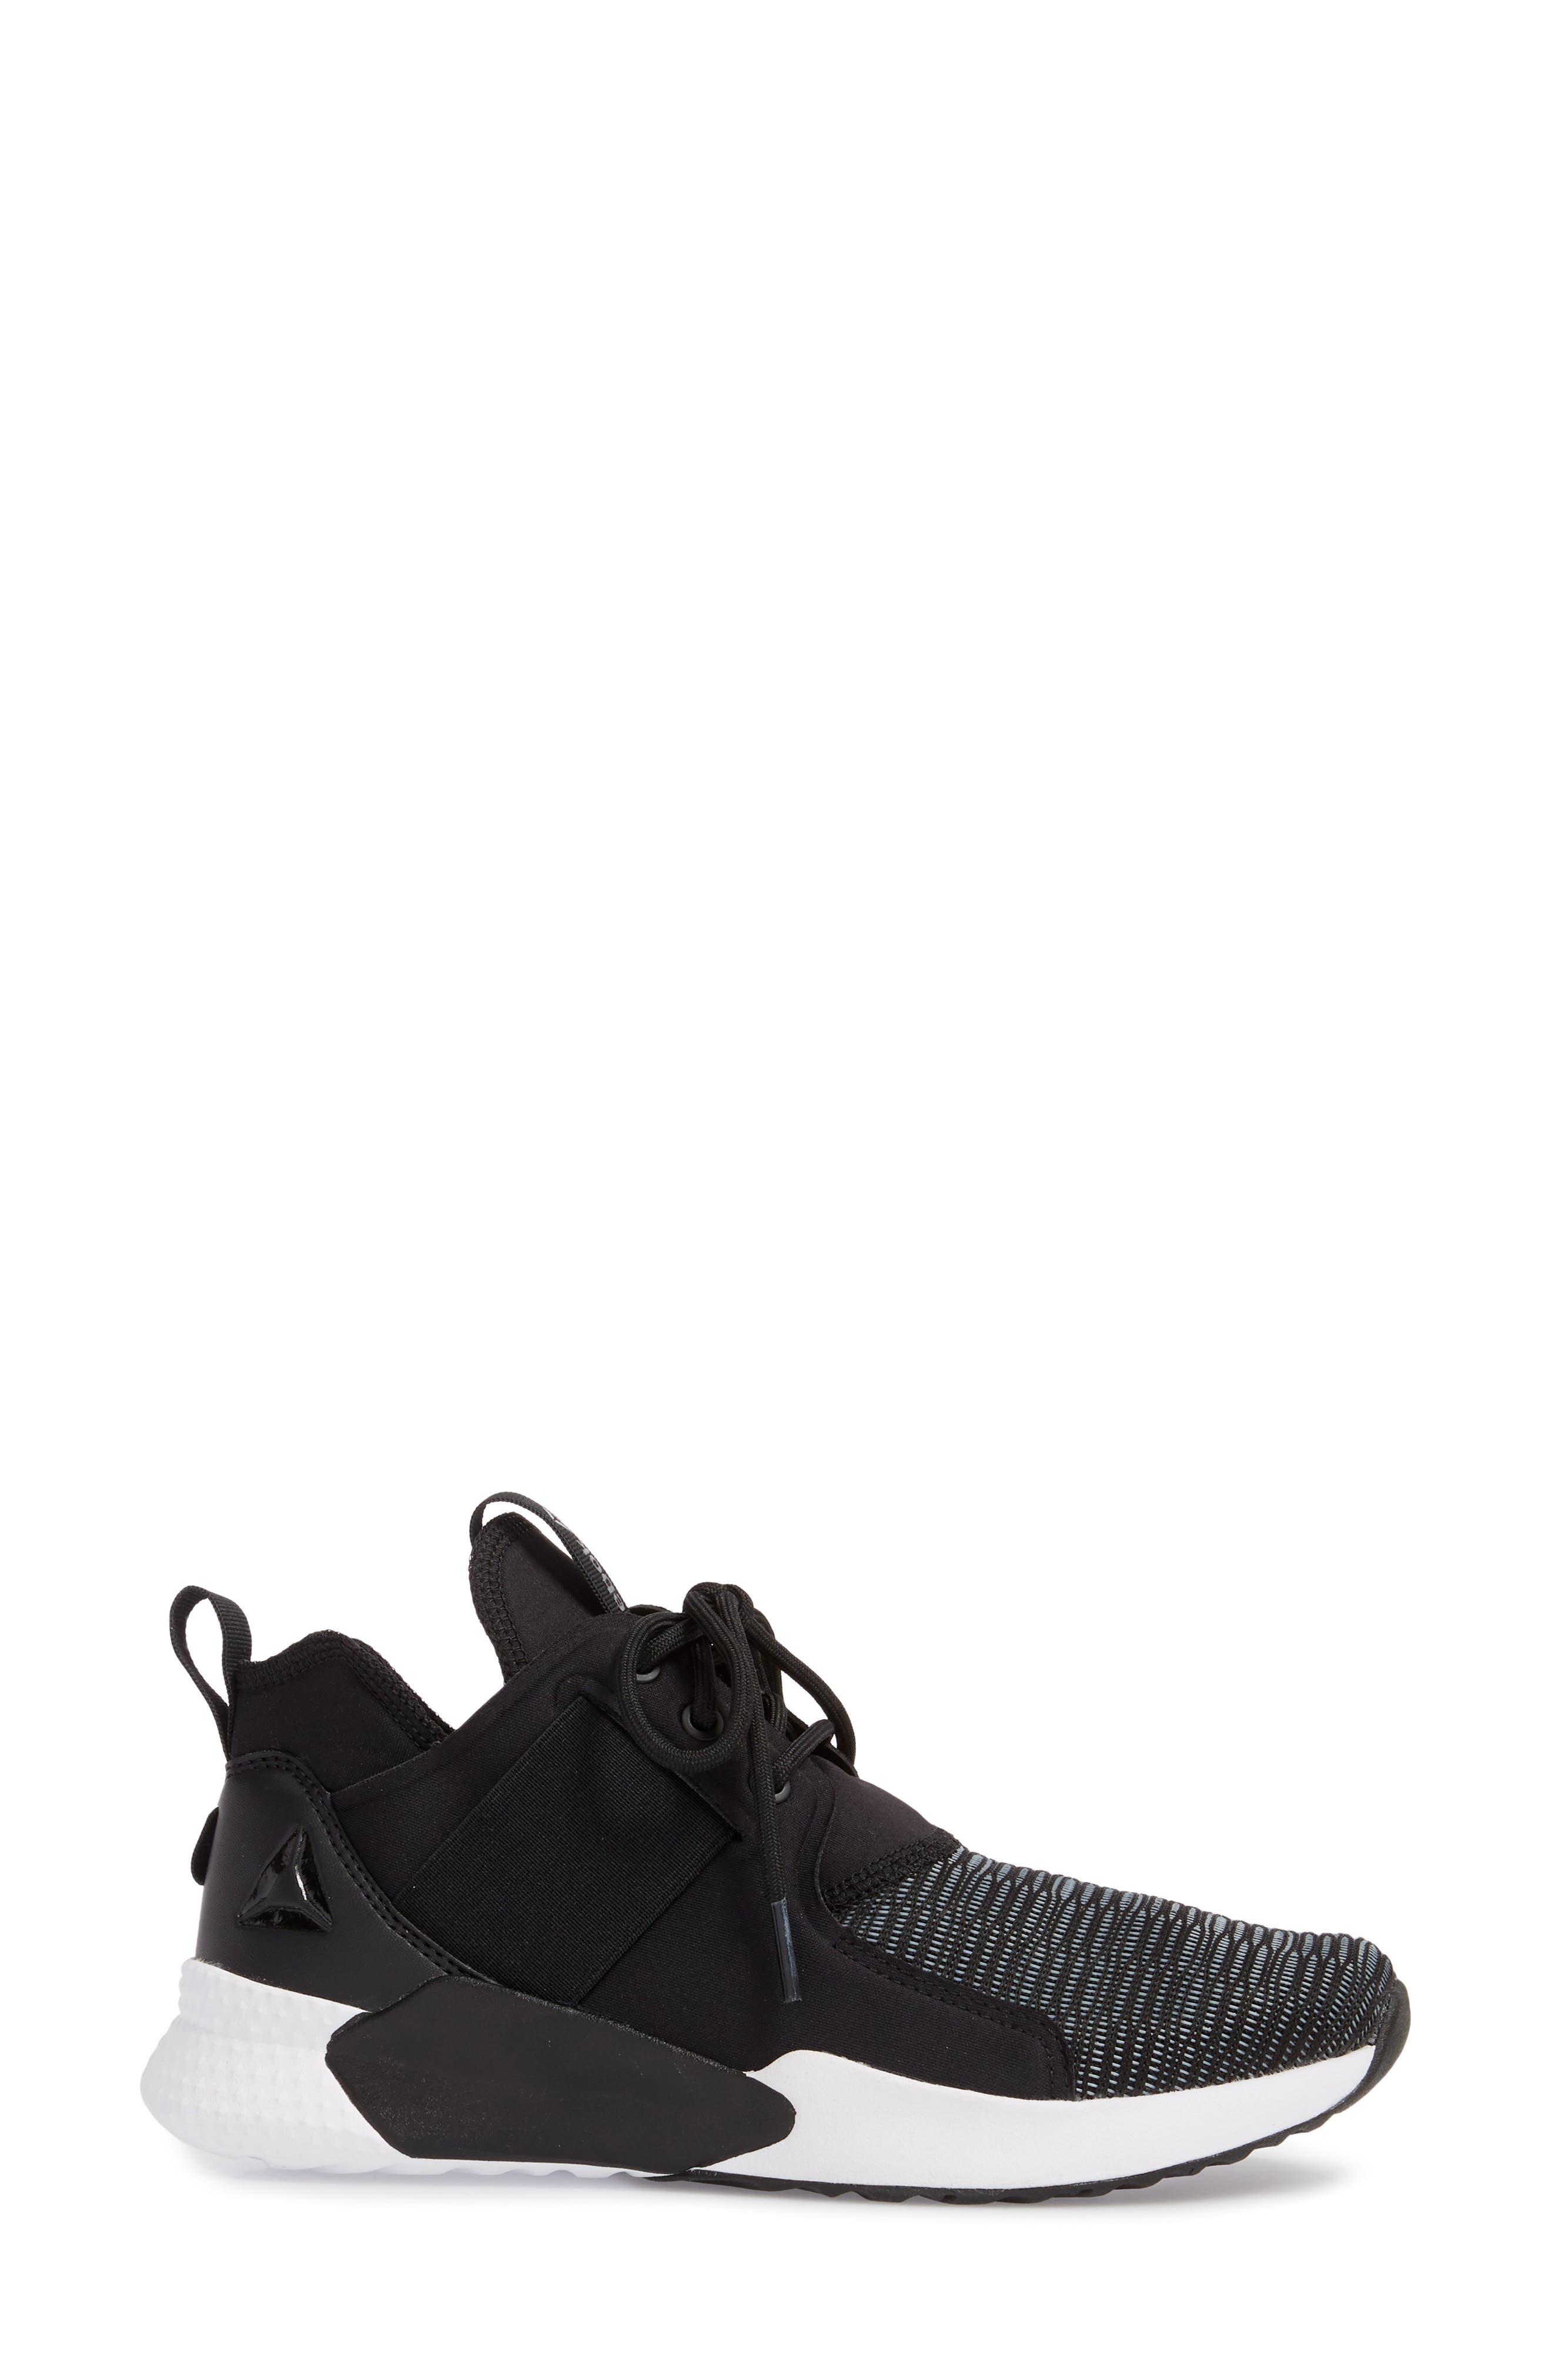 Guresu 1.0 High Top Sneaker,                             Alternate thumbnail 3, color,                             005